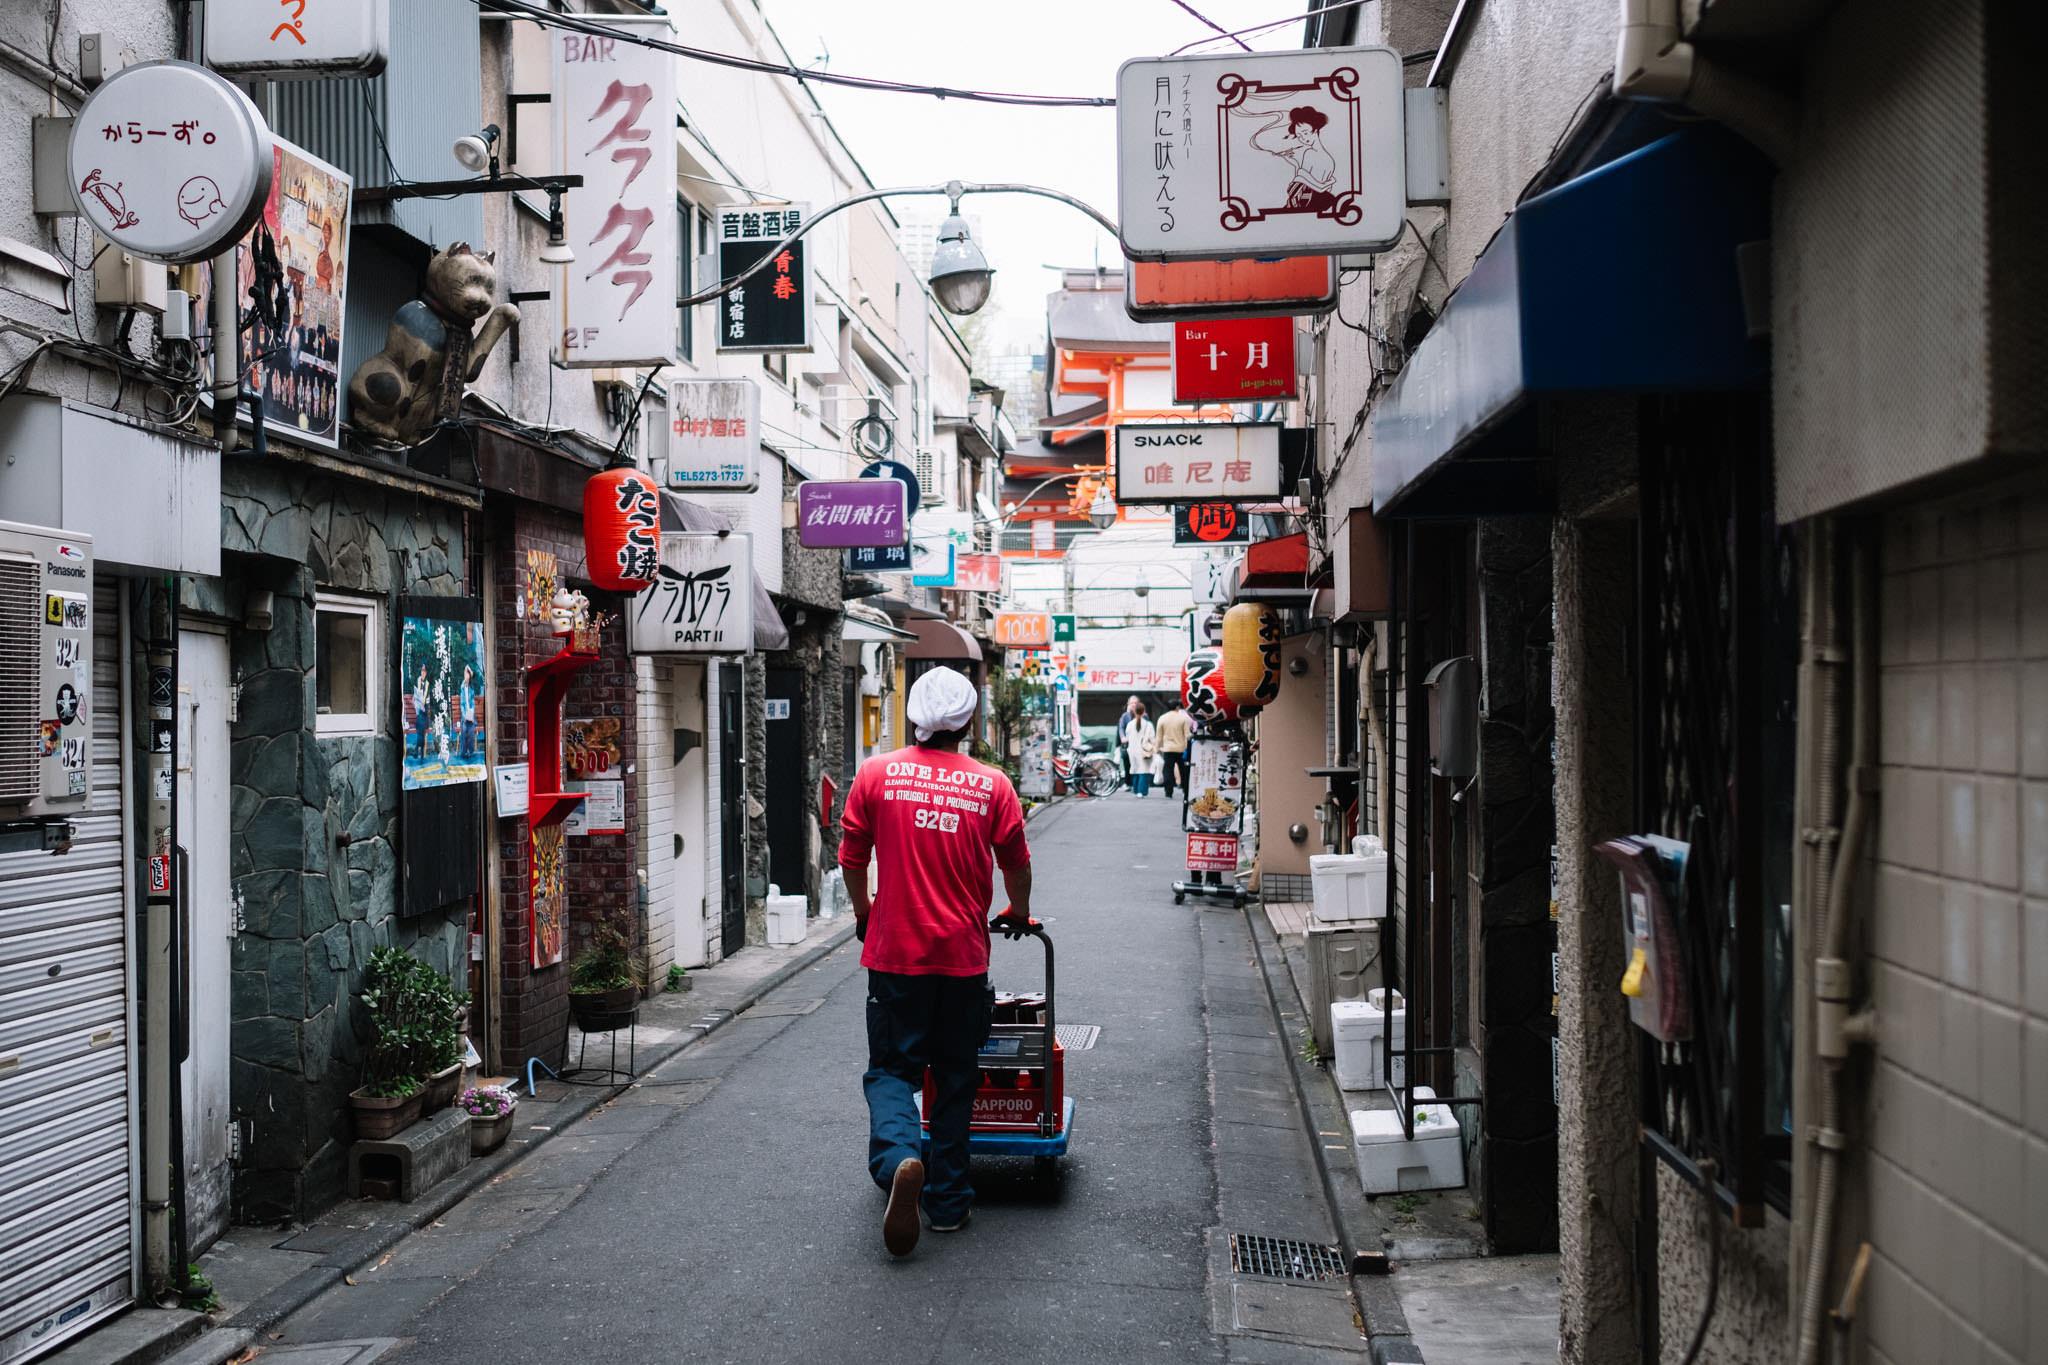 chris_eberhardt_japan_travel_reise_nippon-73.jpg